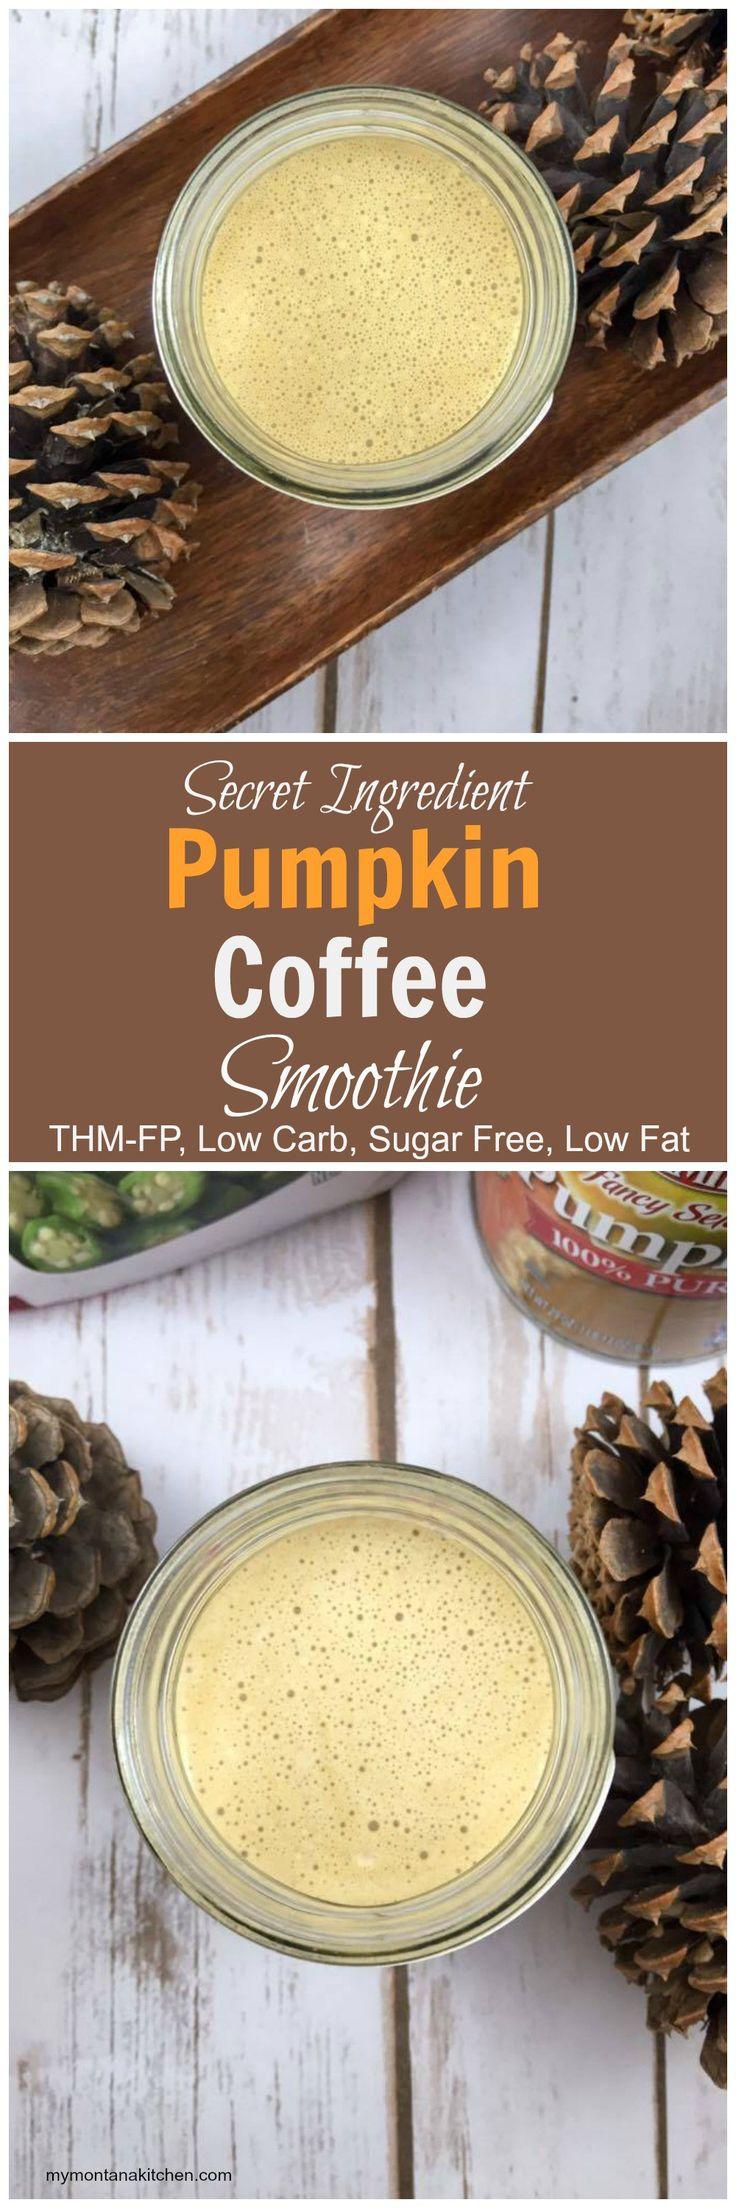 Secret Ingredient Pumpkin Coffee Smoothie {THM-FP, Low Carb, Sugar Free, Low Fat} - My Montana Kitchen